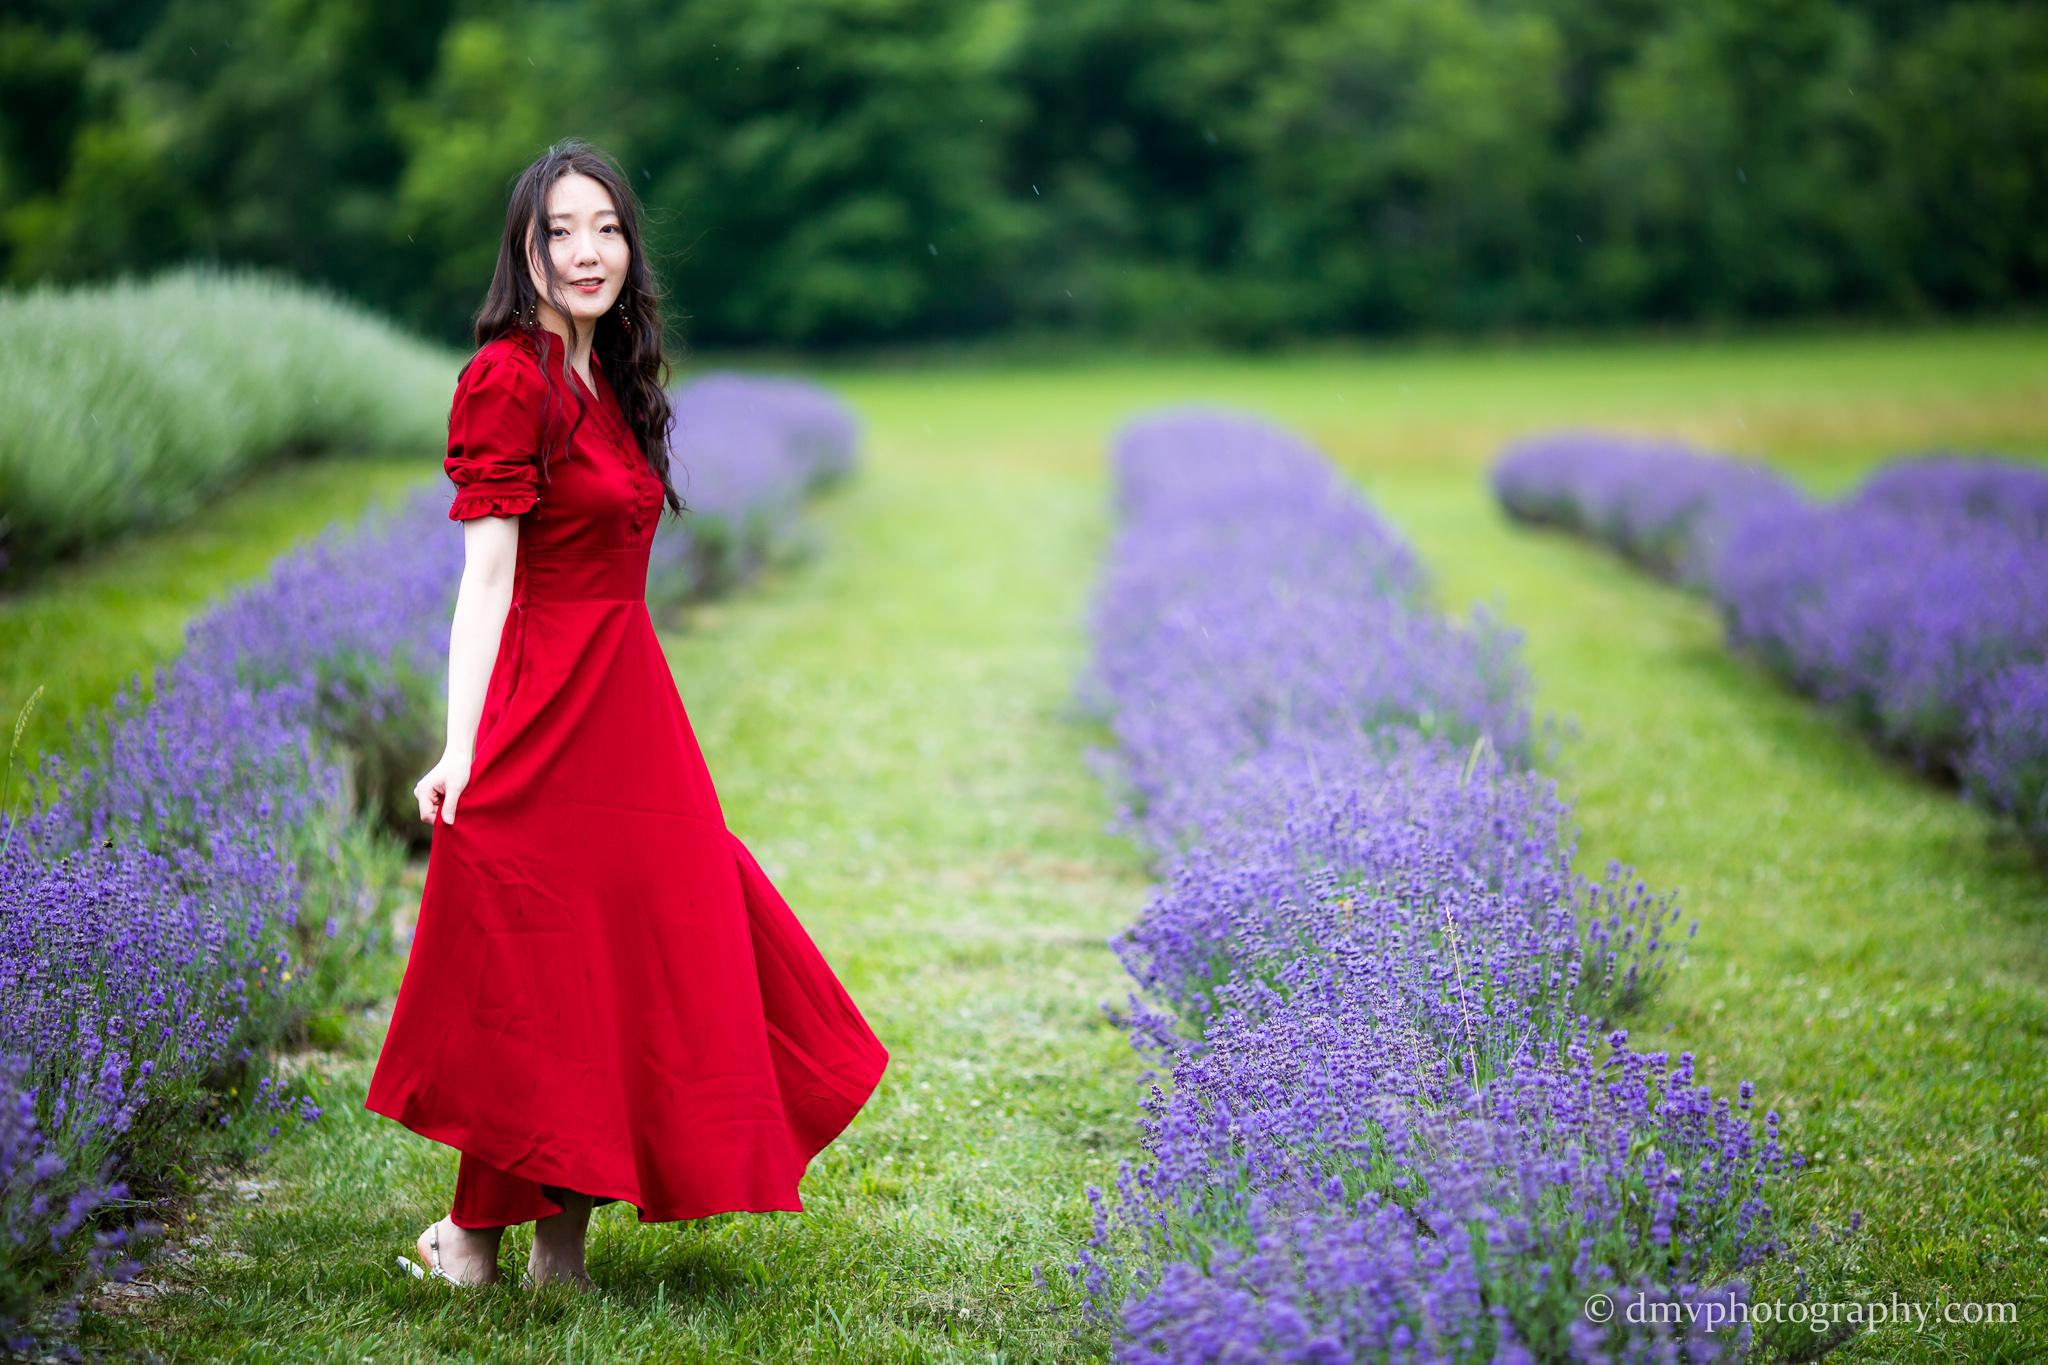 2016-06-24 - Zhu Xing - Lavender Field - 00009